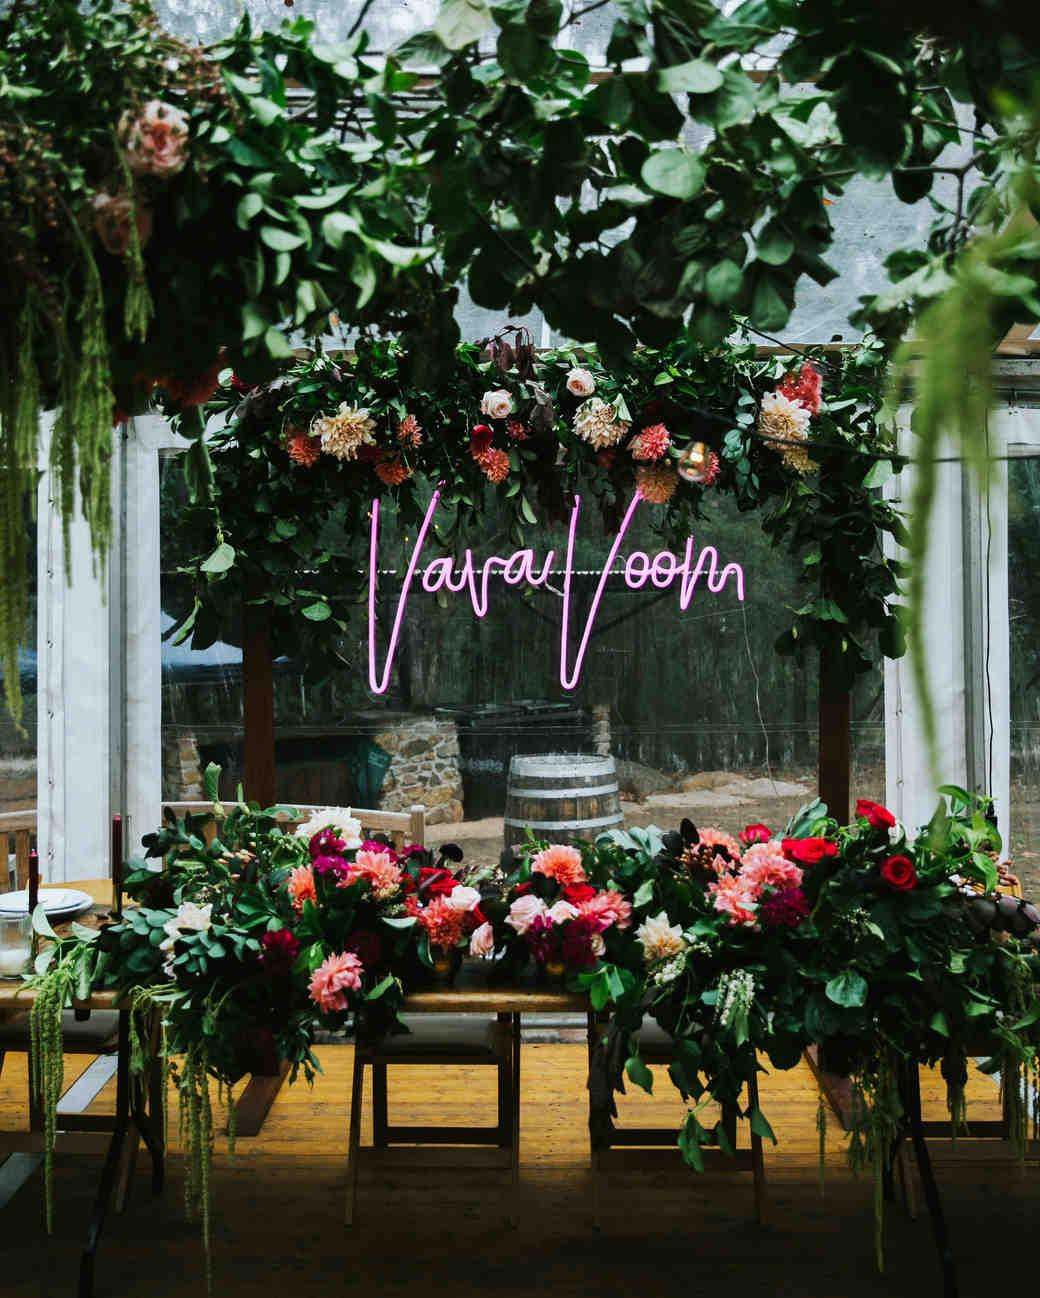 vava voom neon sign in reception floral decor